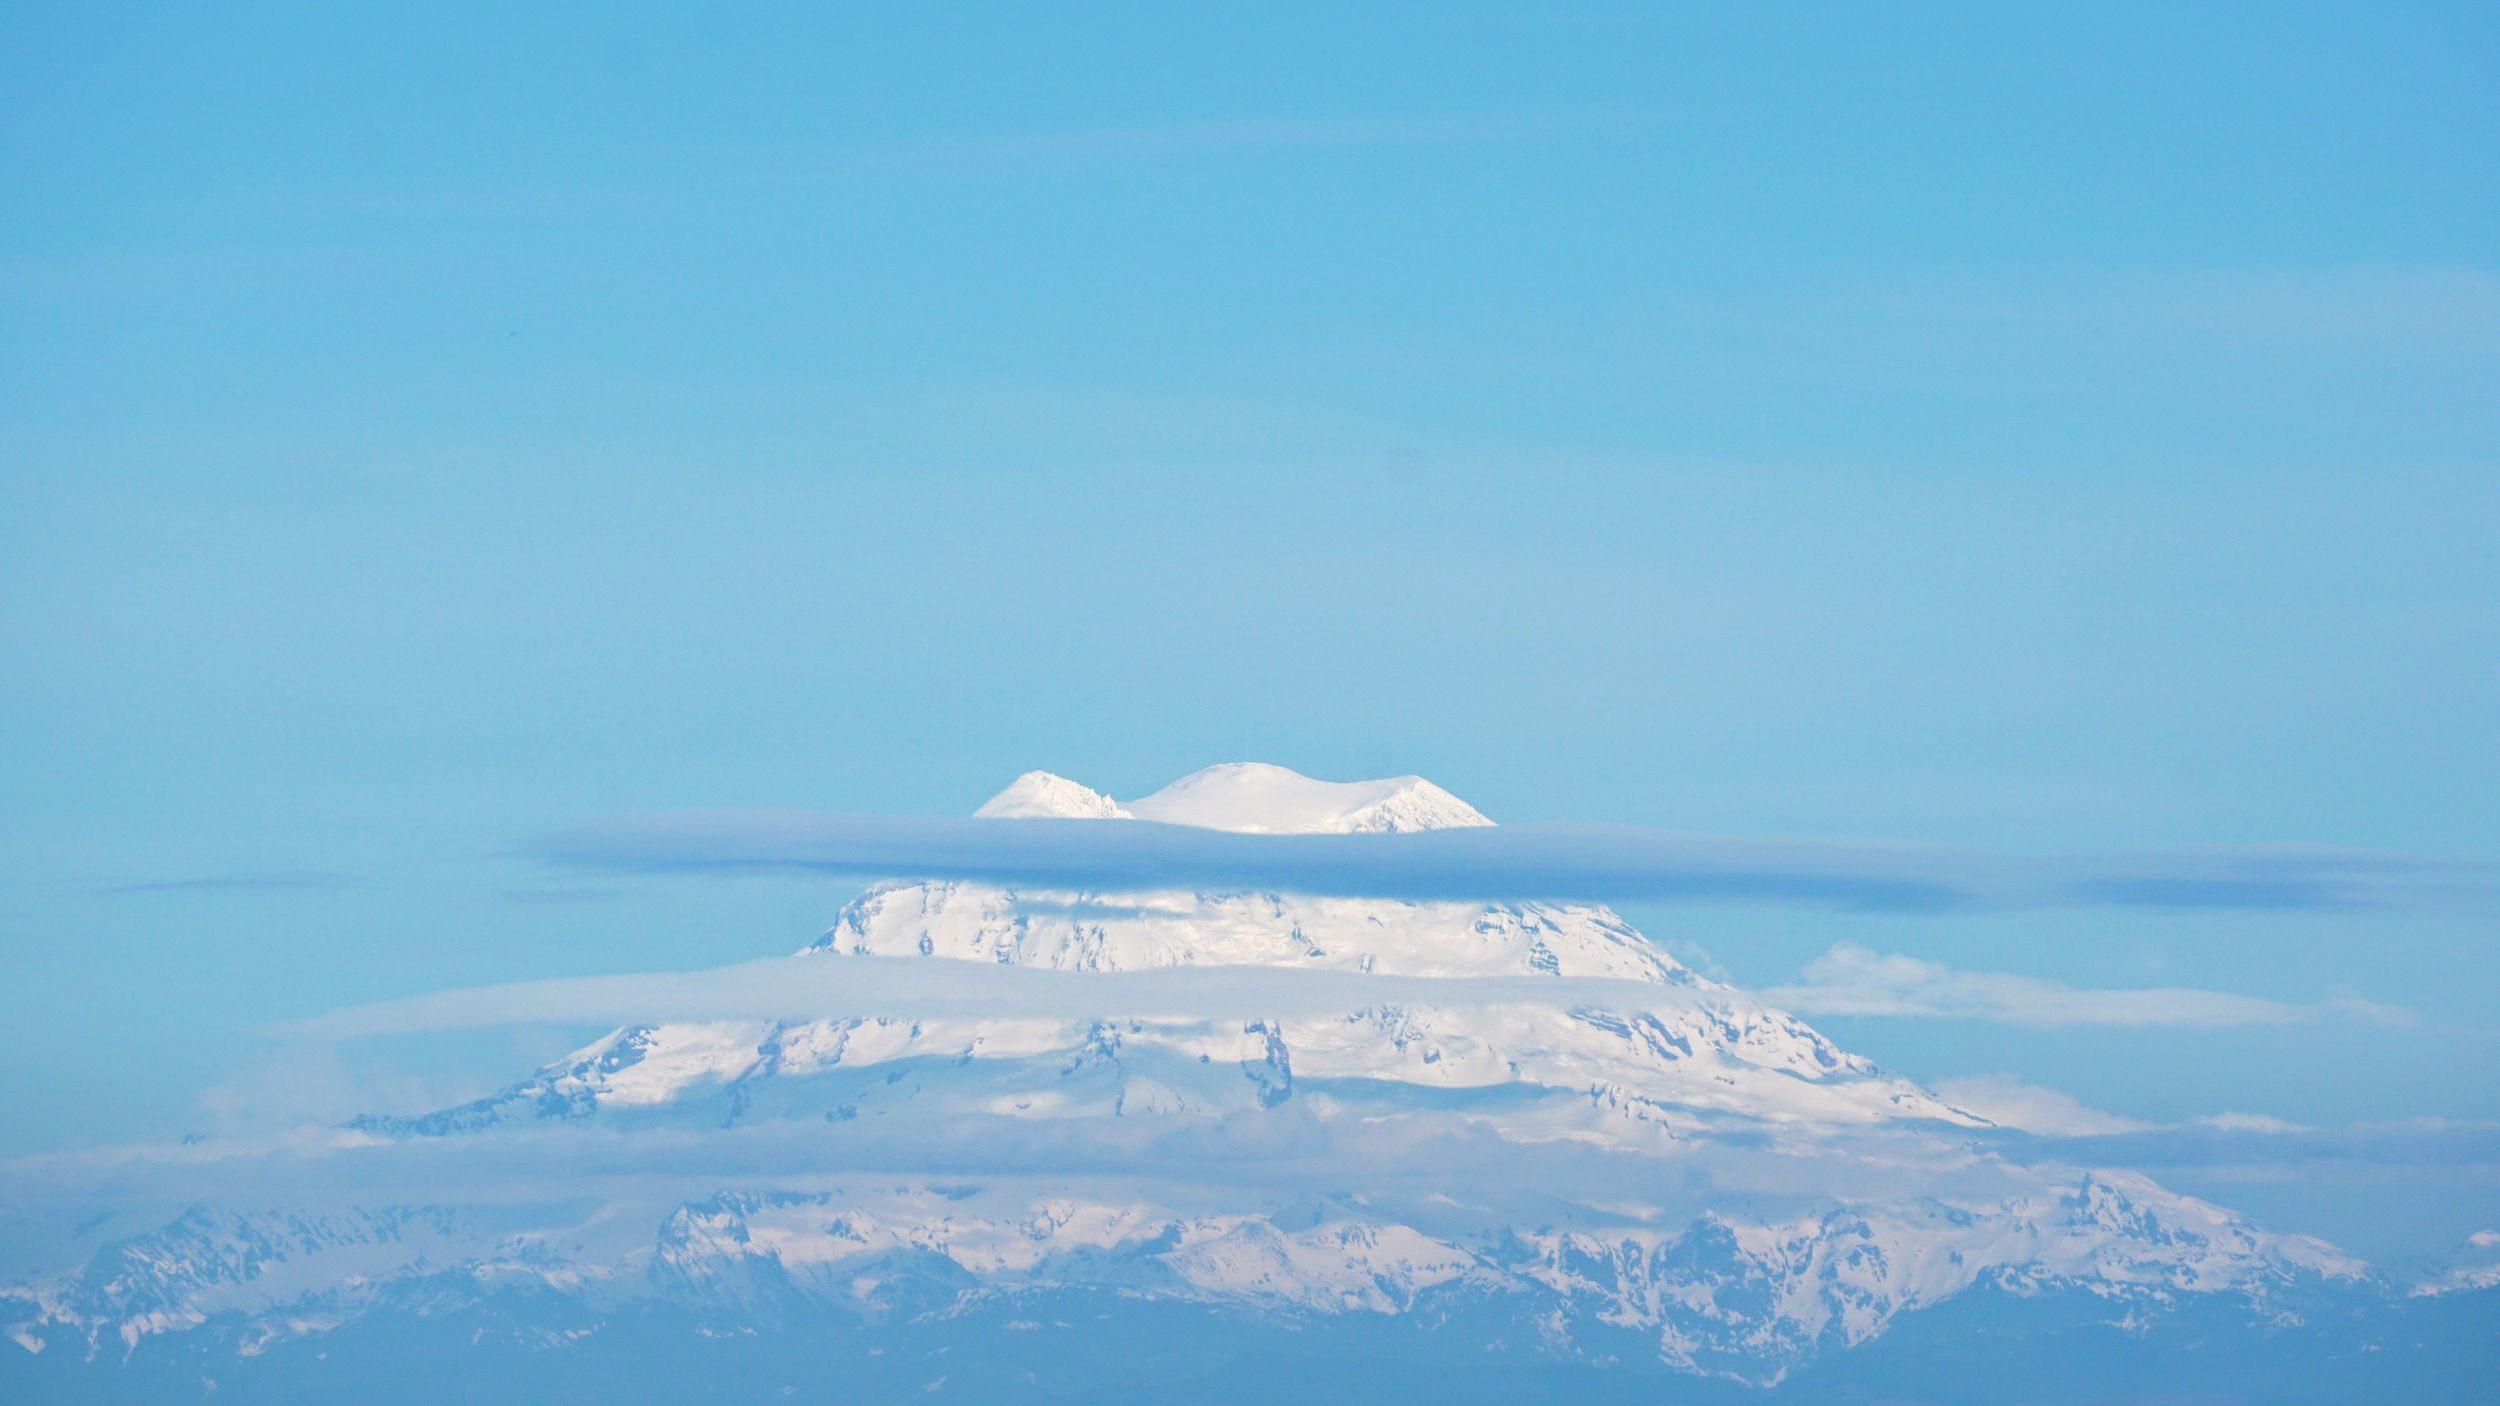 Mt. Rainier seen from Rock Candy Mountain